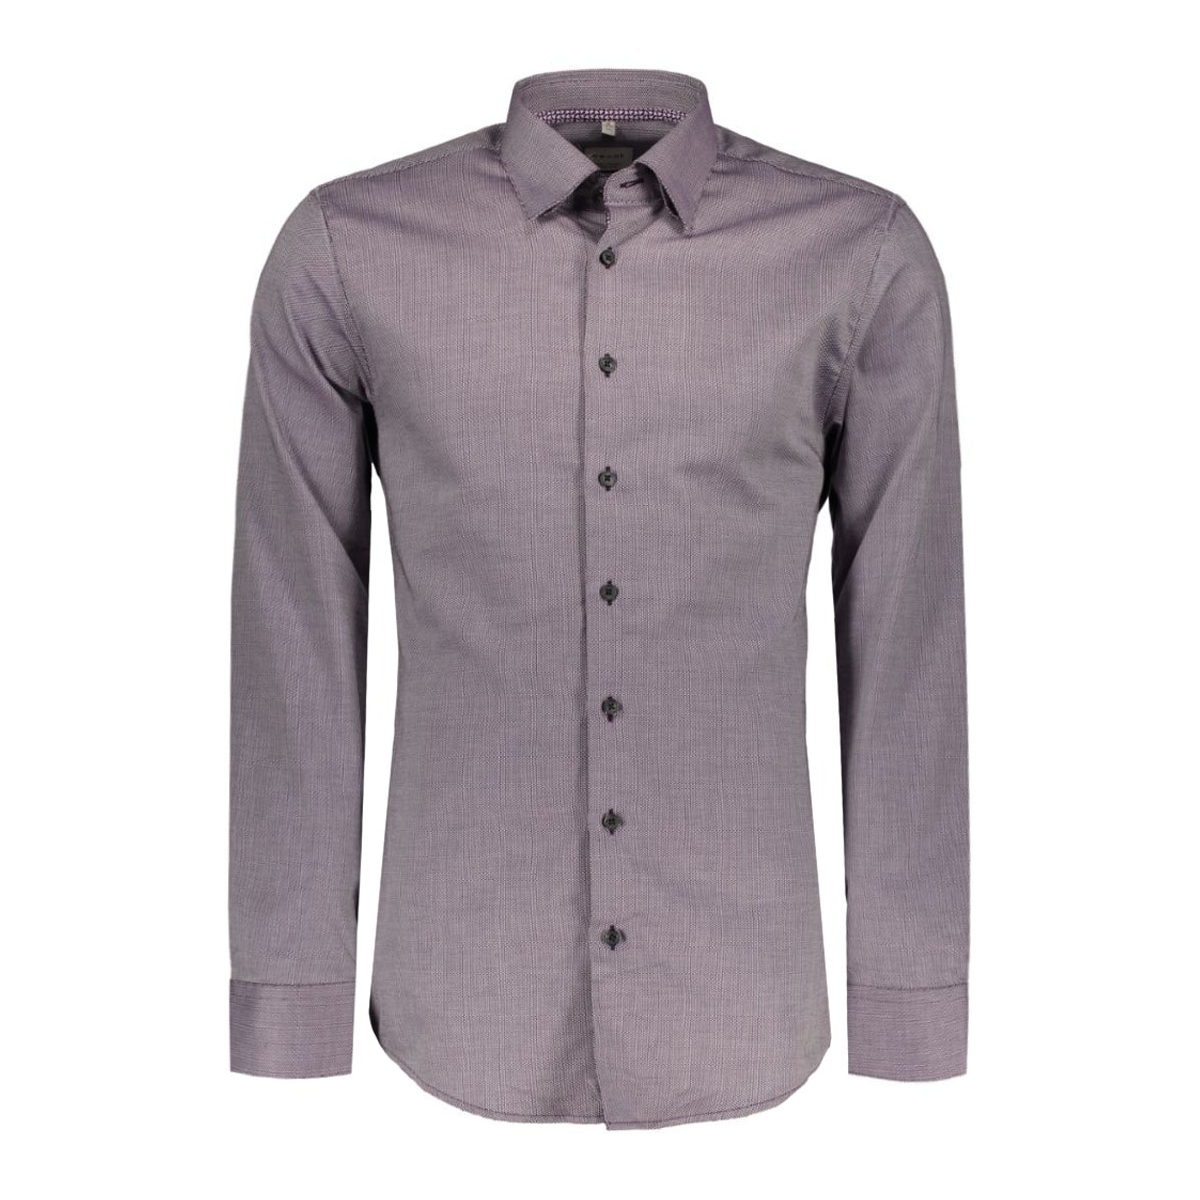 1270 8003 haupt overhemd 03